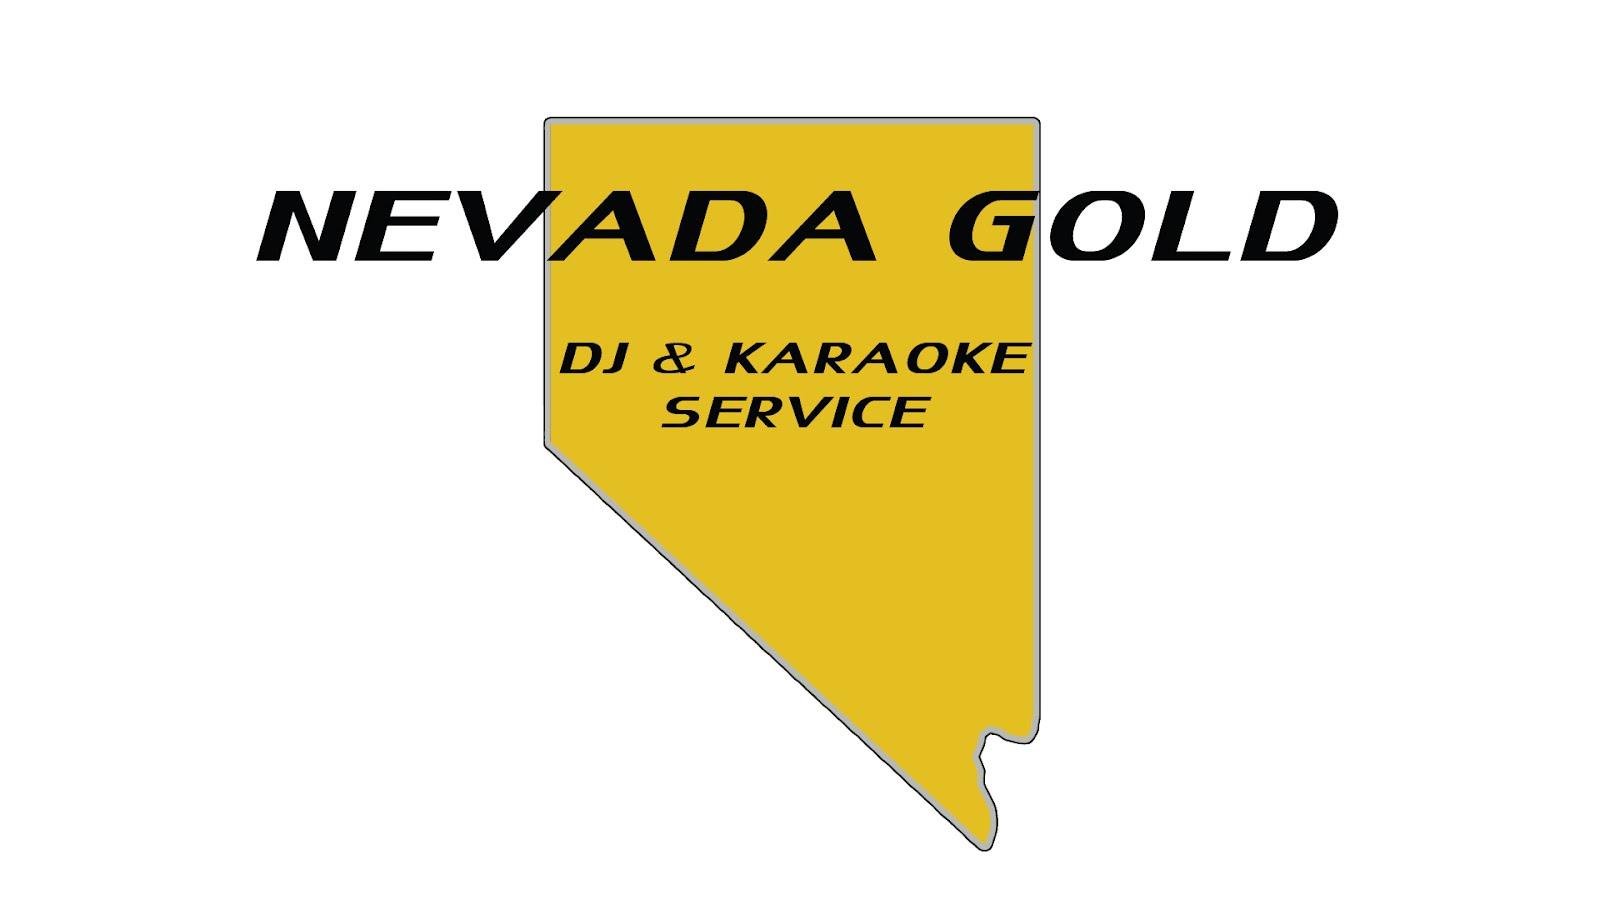 NEVADA GOLD DJ & KARAOKE SERVICE